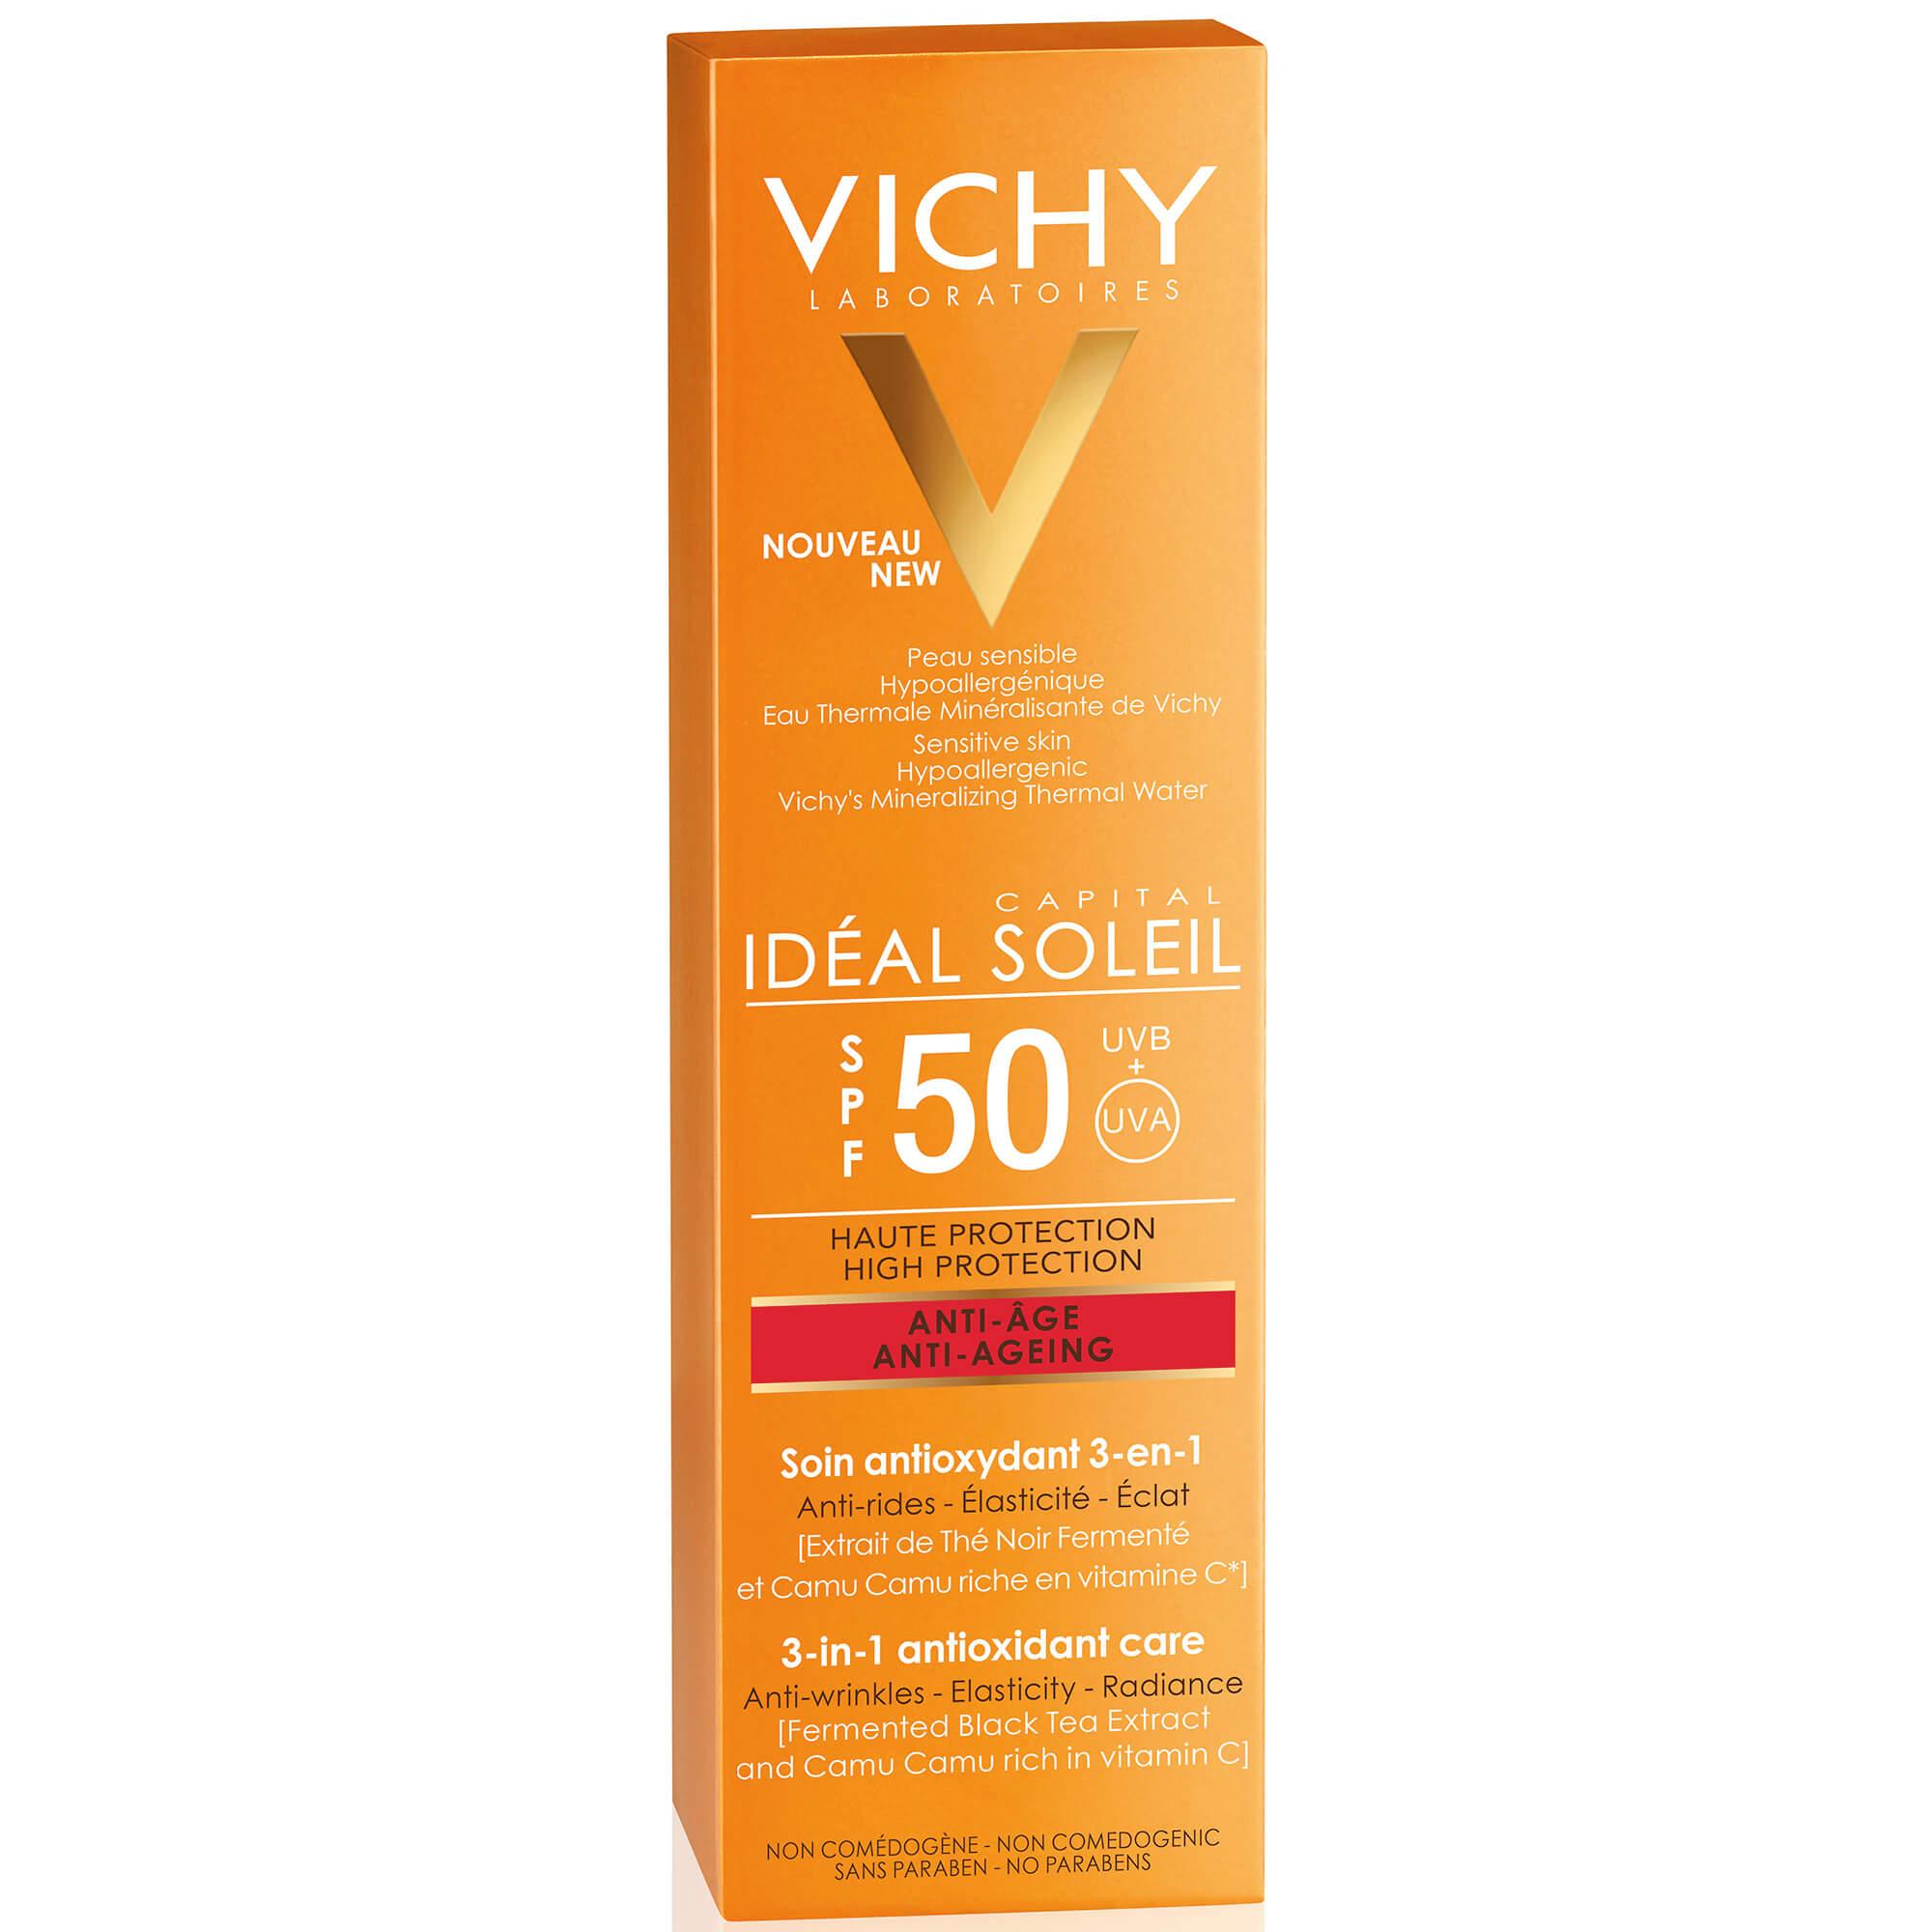 Vichy Ideal Soleil Spf50 Anti-Age Antioxidant 3 in 1 Αντηλιακή Αντιρυτιδική Κρέμα Υψηλής Προστασίας με Αντιοξειδωτική Δράση 50ml